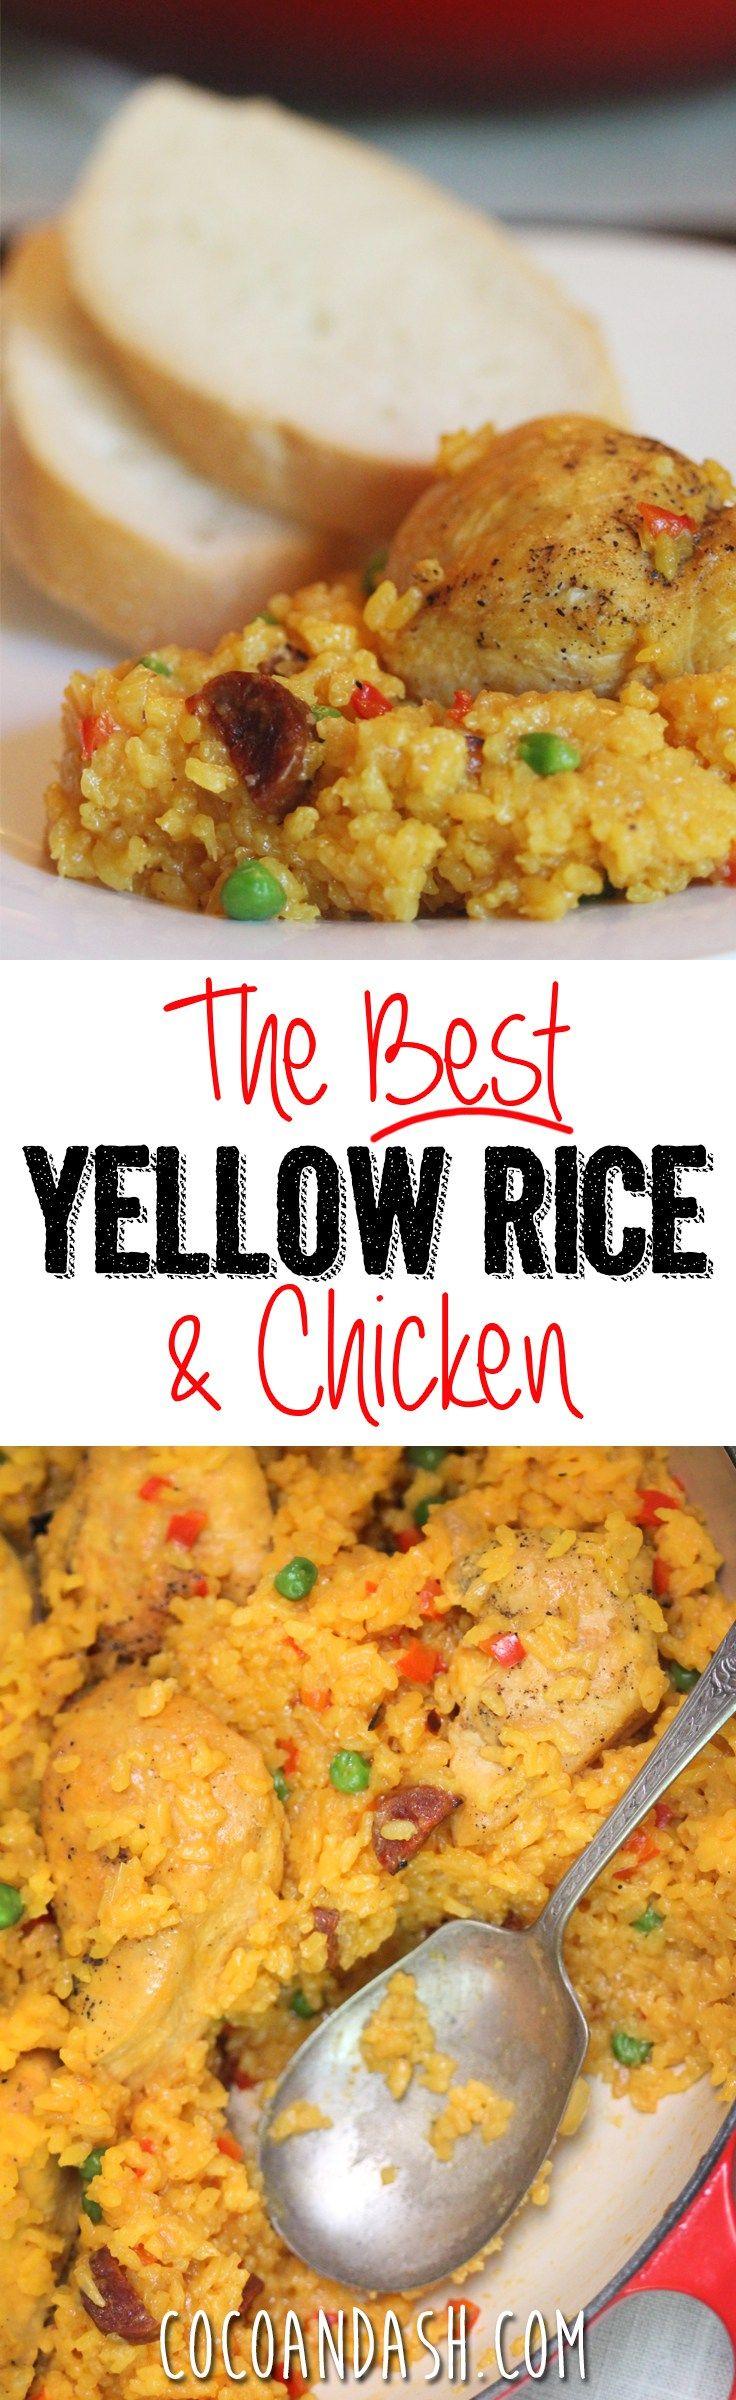 Yellow Rice and Chicken